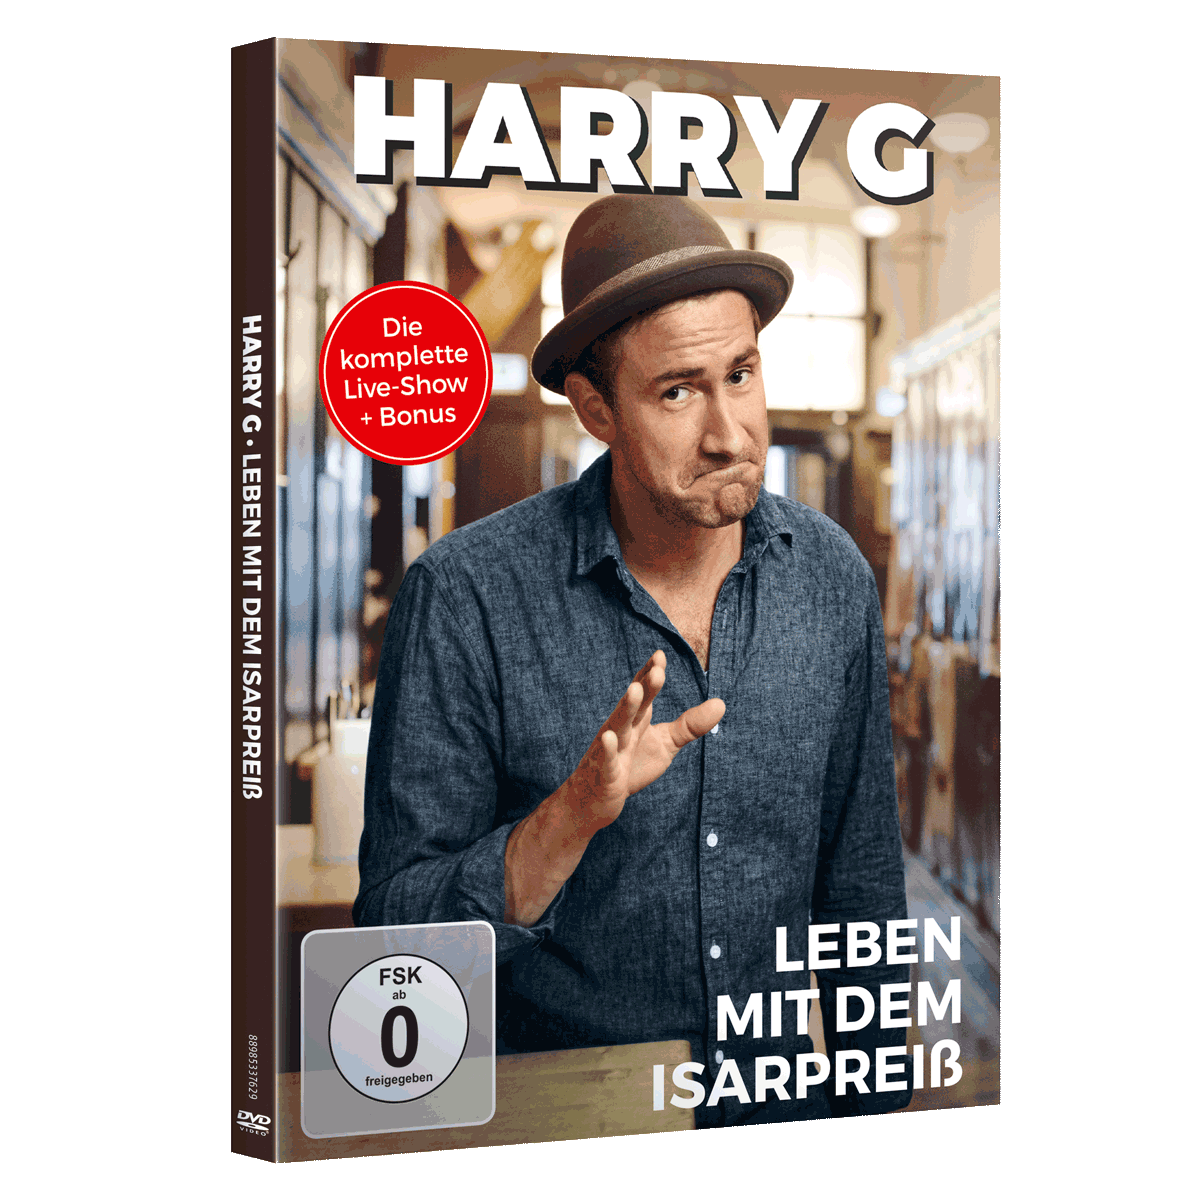 Harry G Dvd